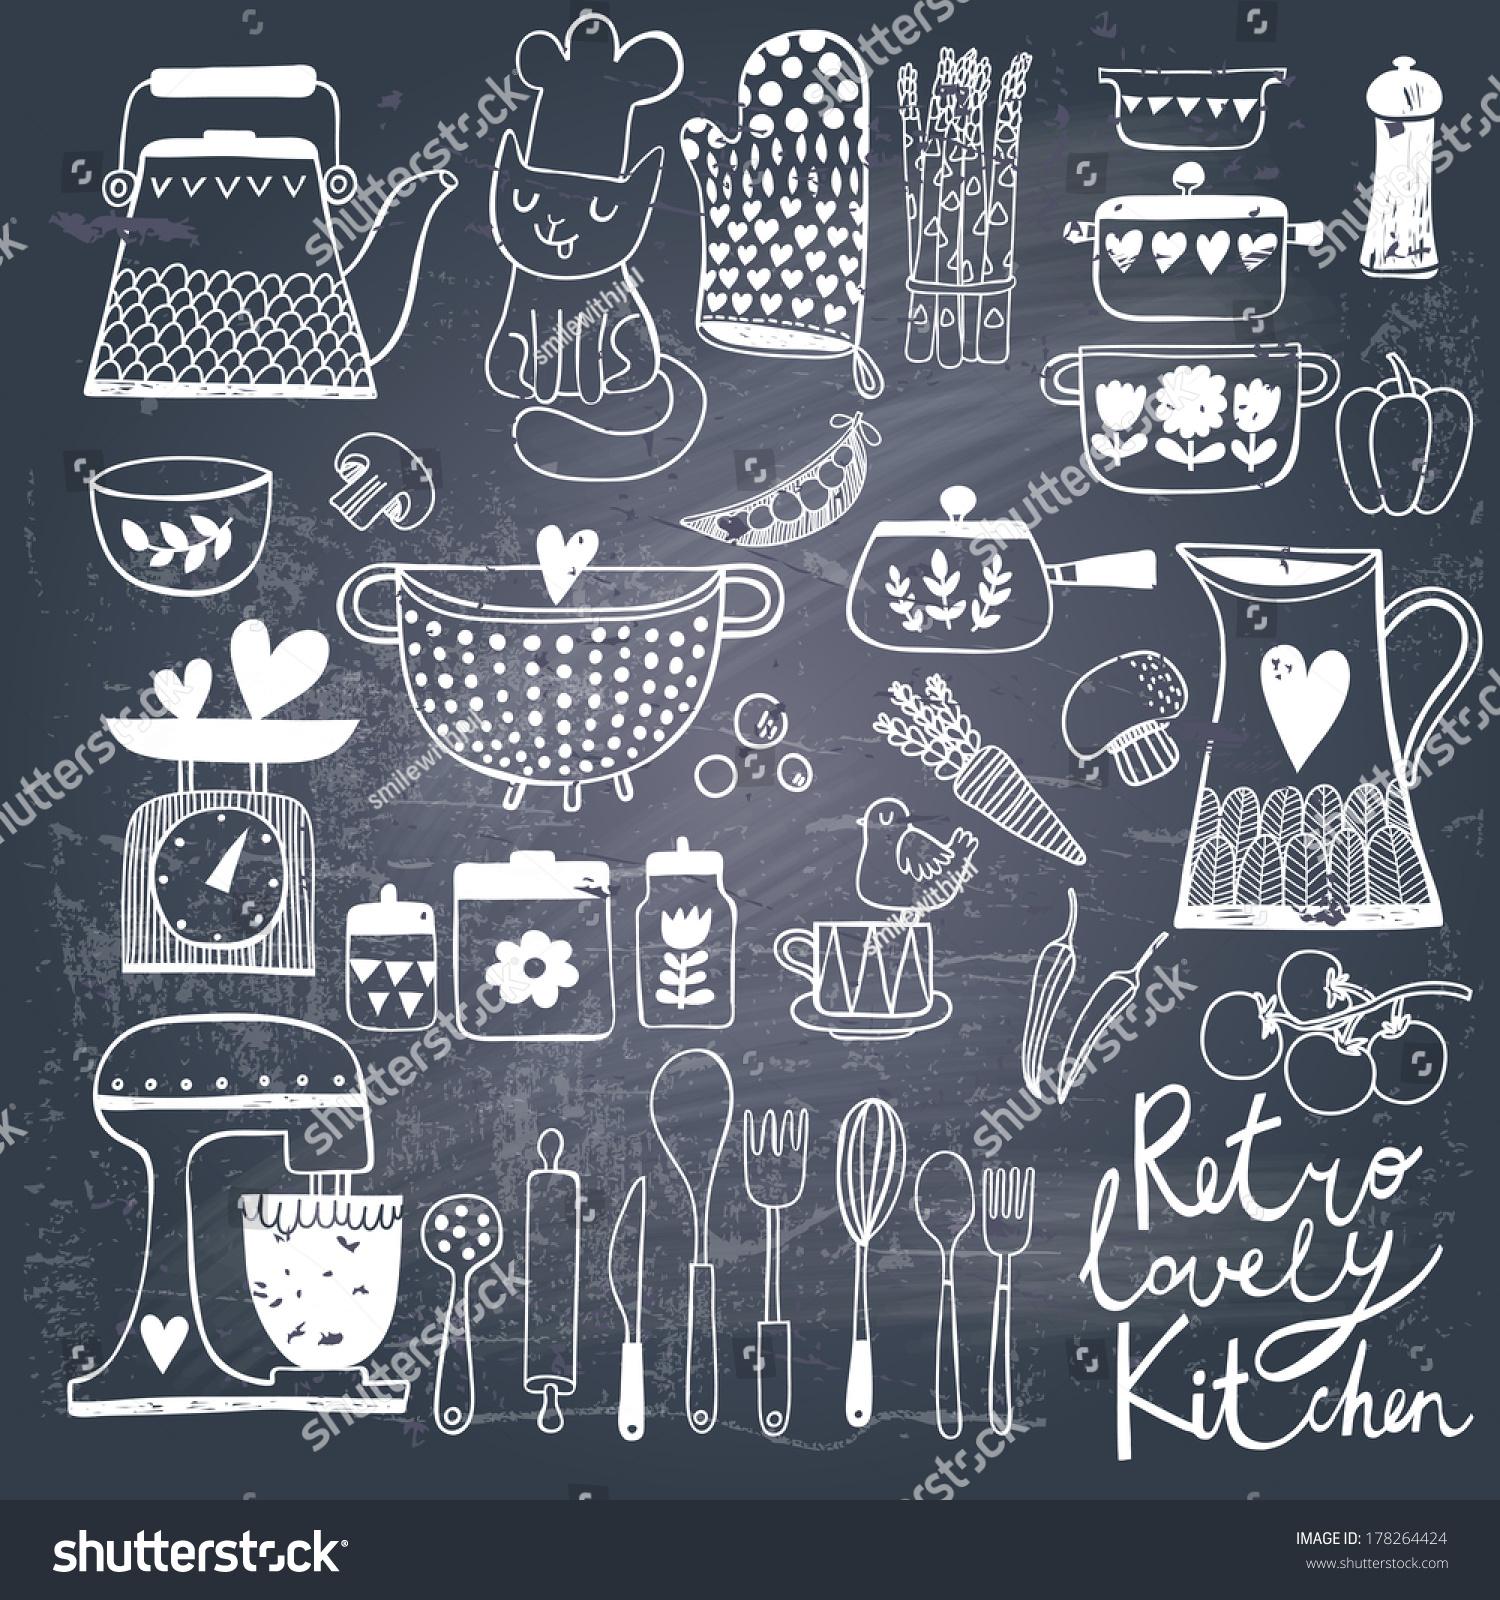 Vintage Kitchen Background ~ Vintage kitchen set in vector on chalkboard background